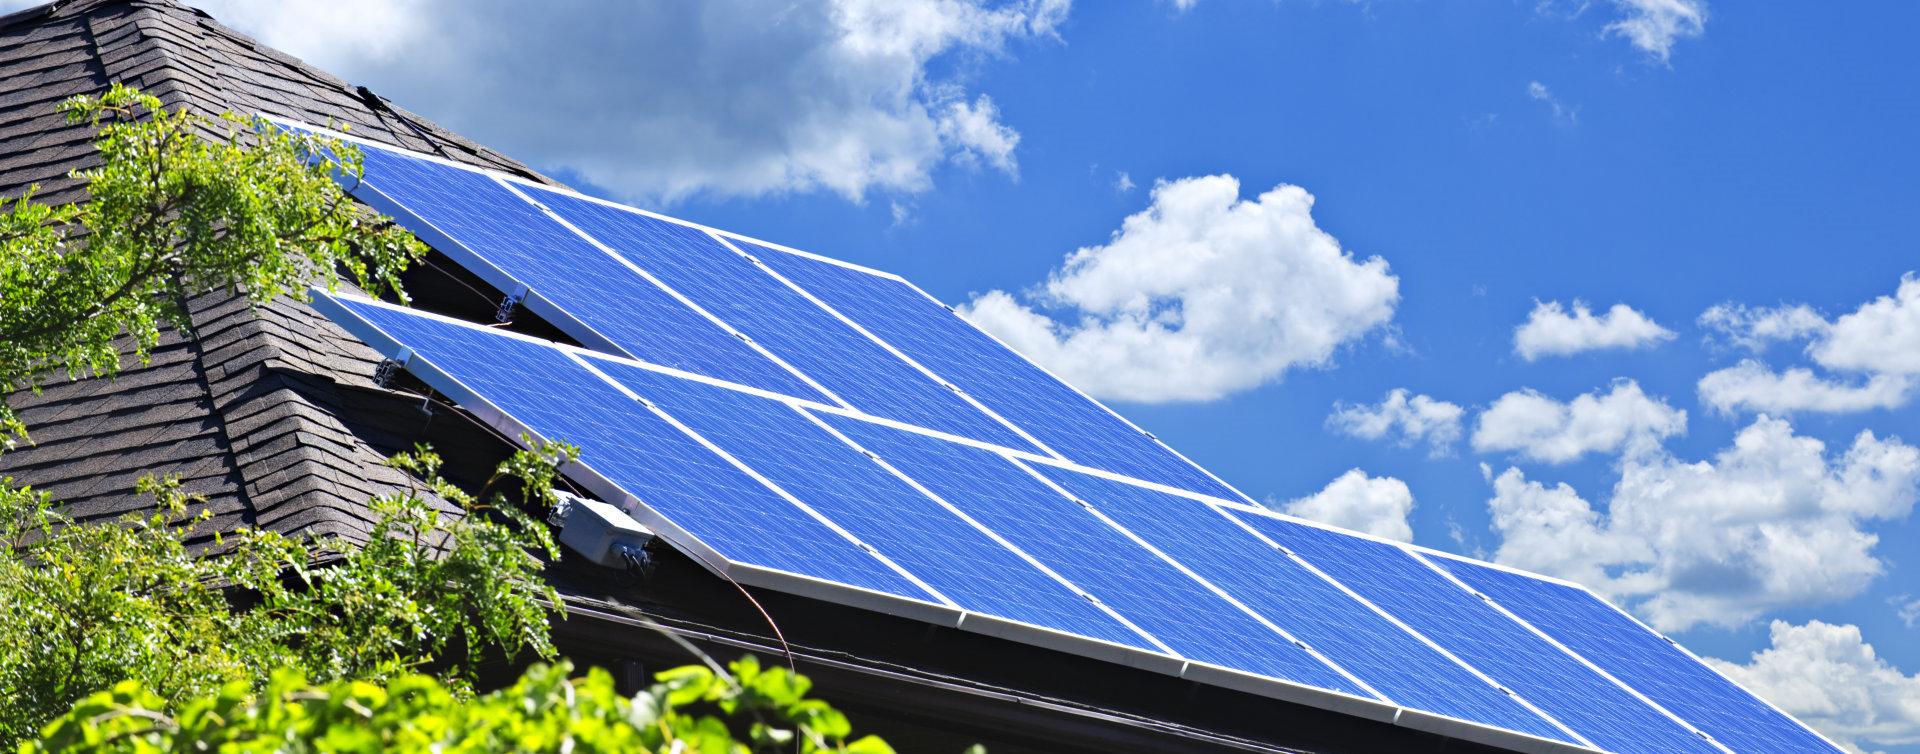 renewable energy with solar panels